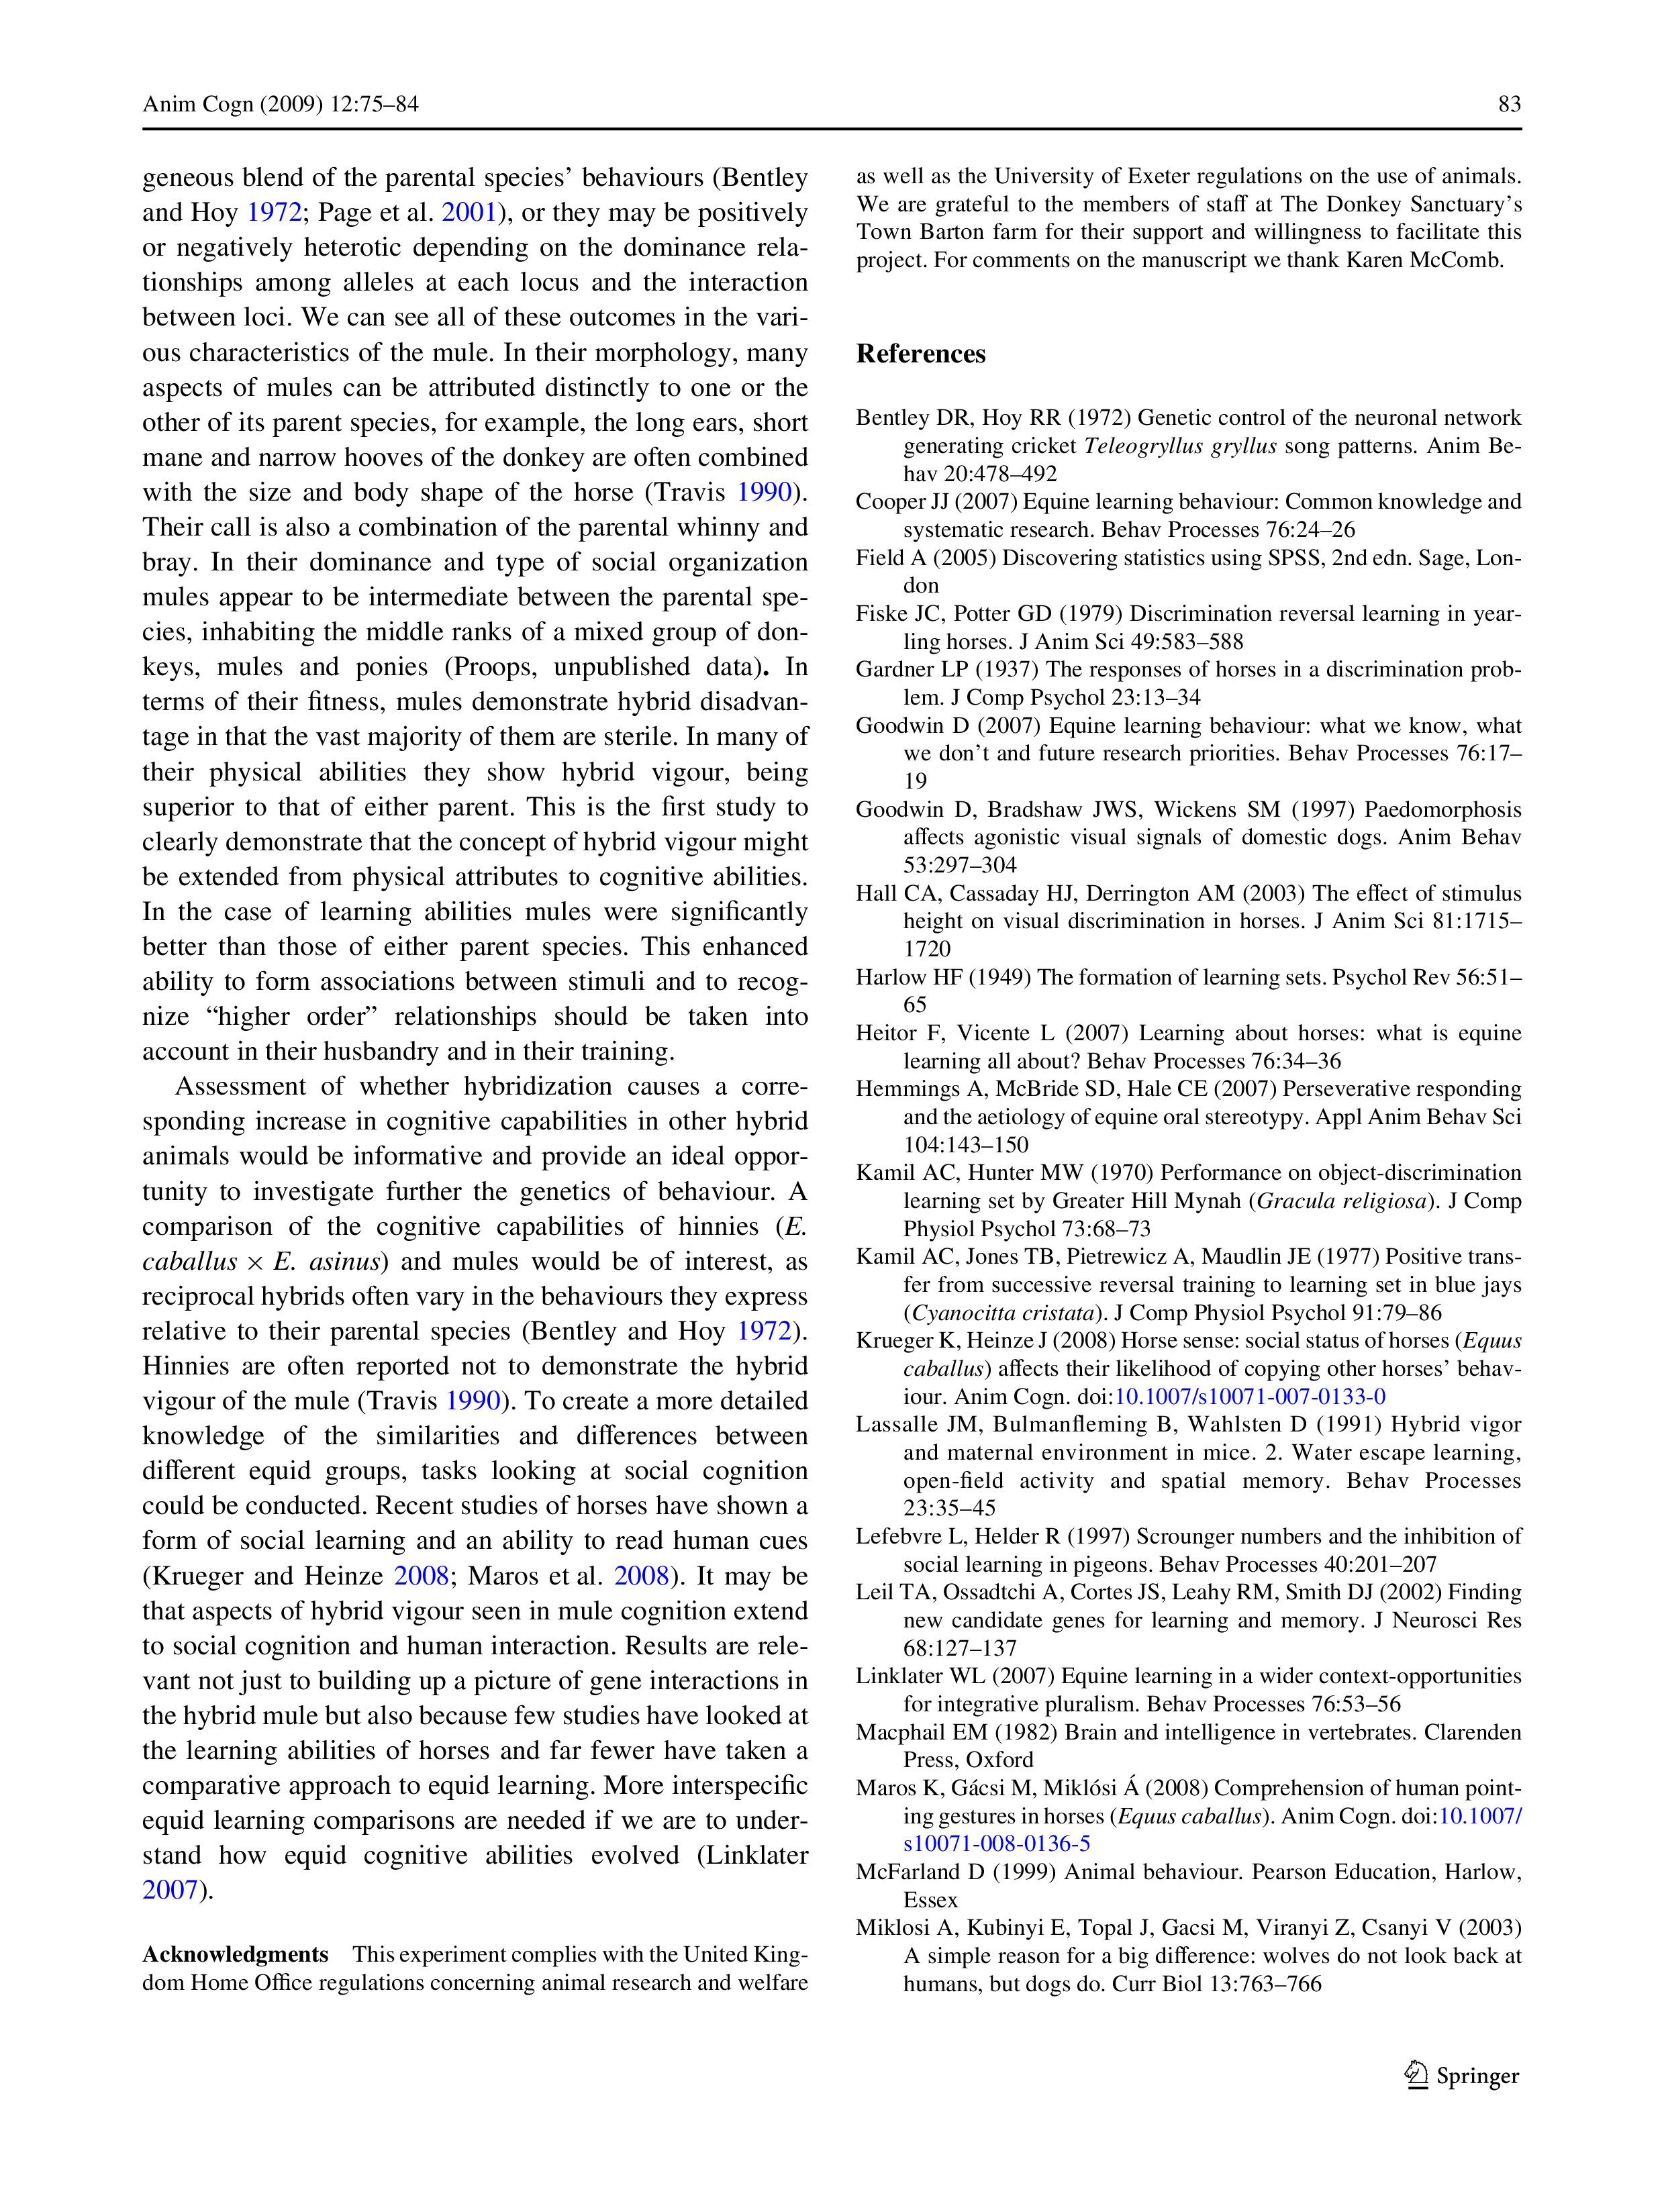 page-8.jpg